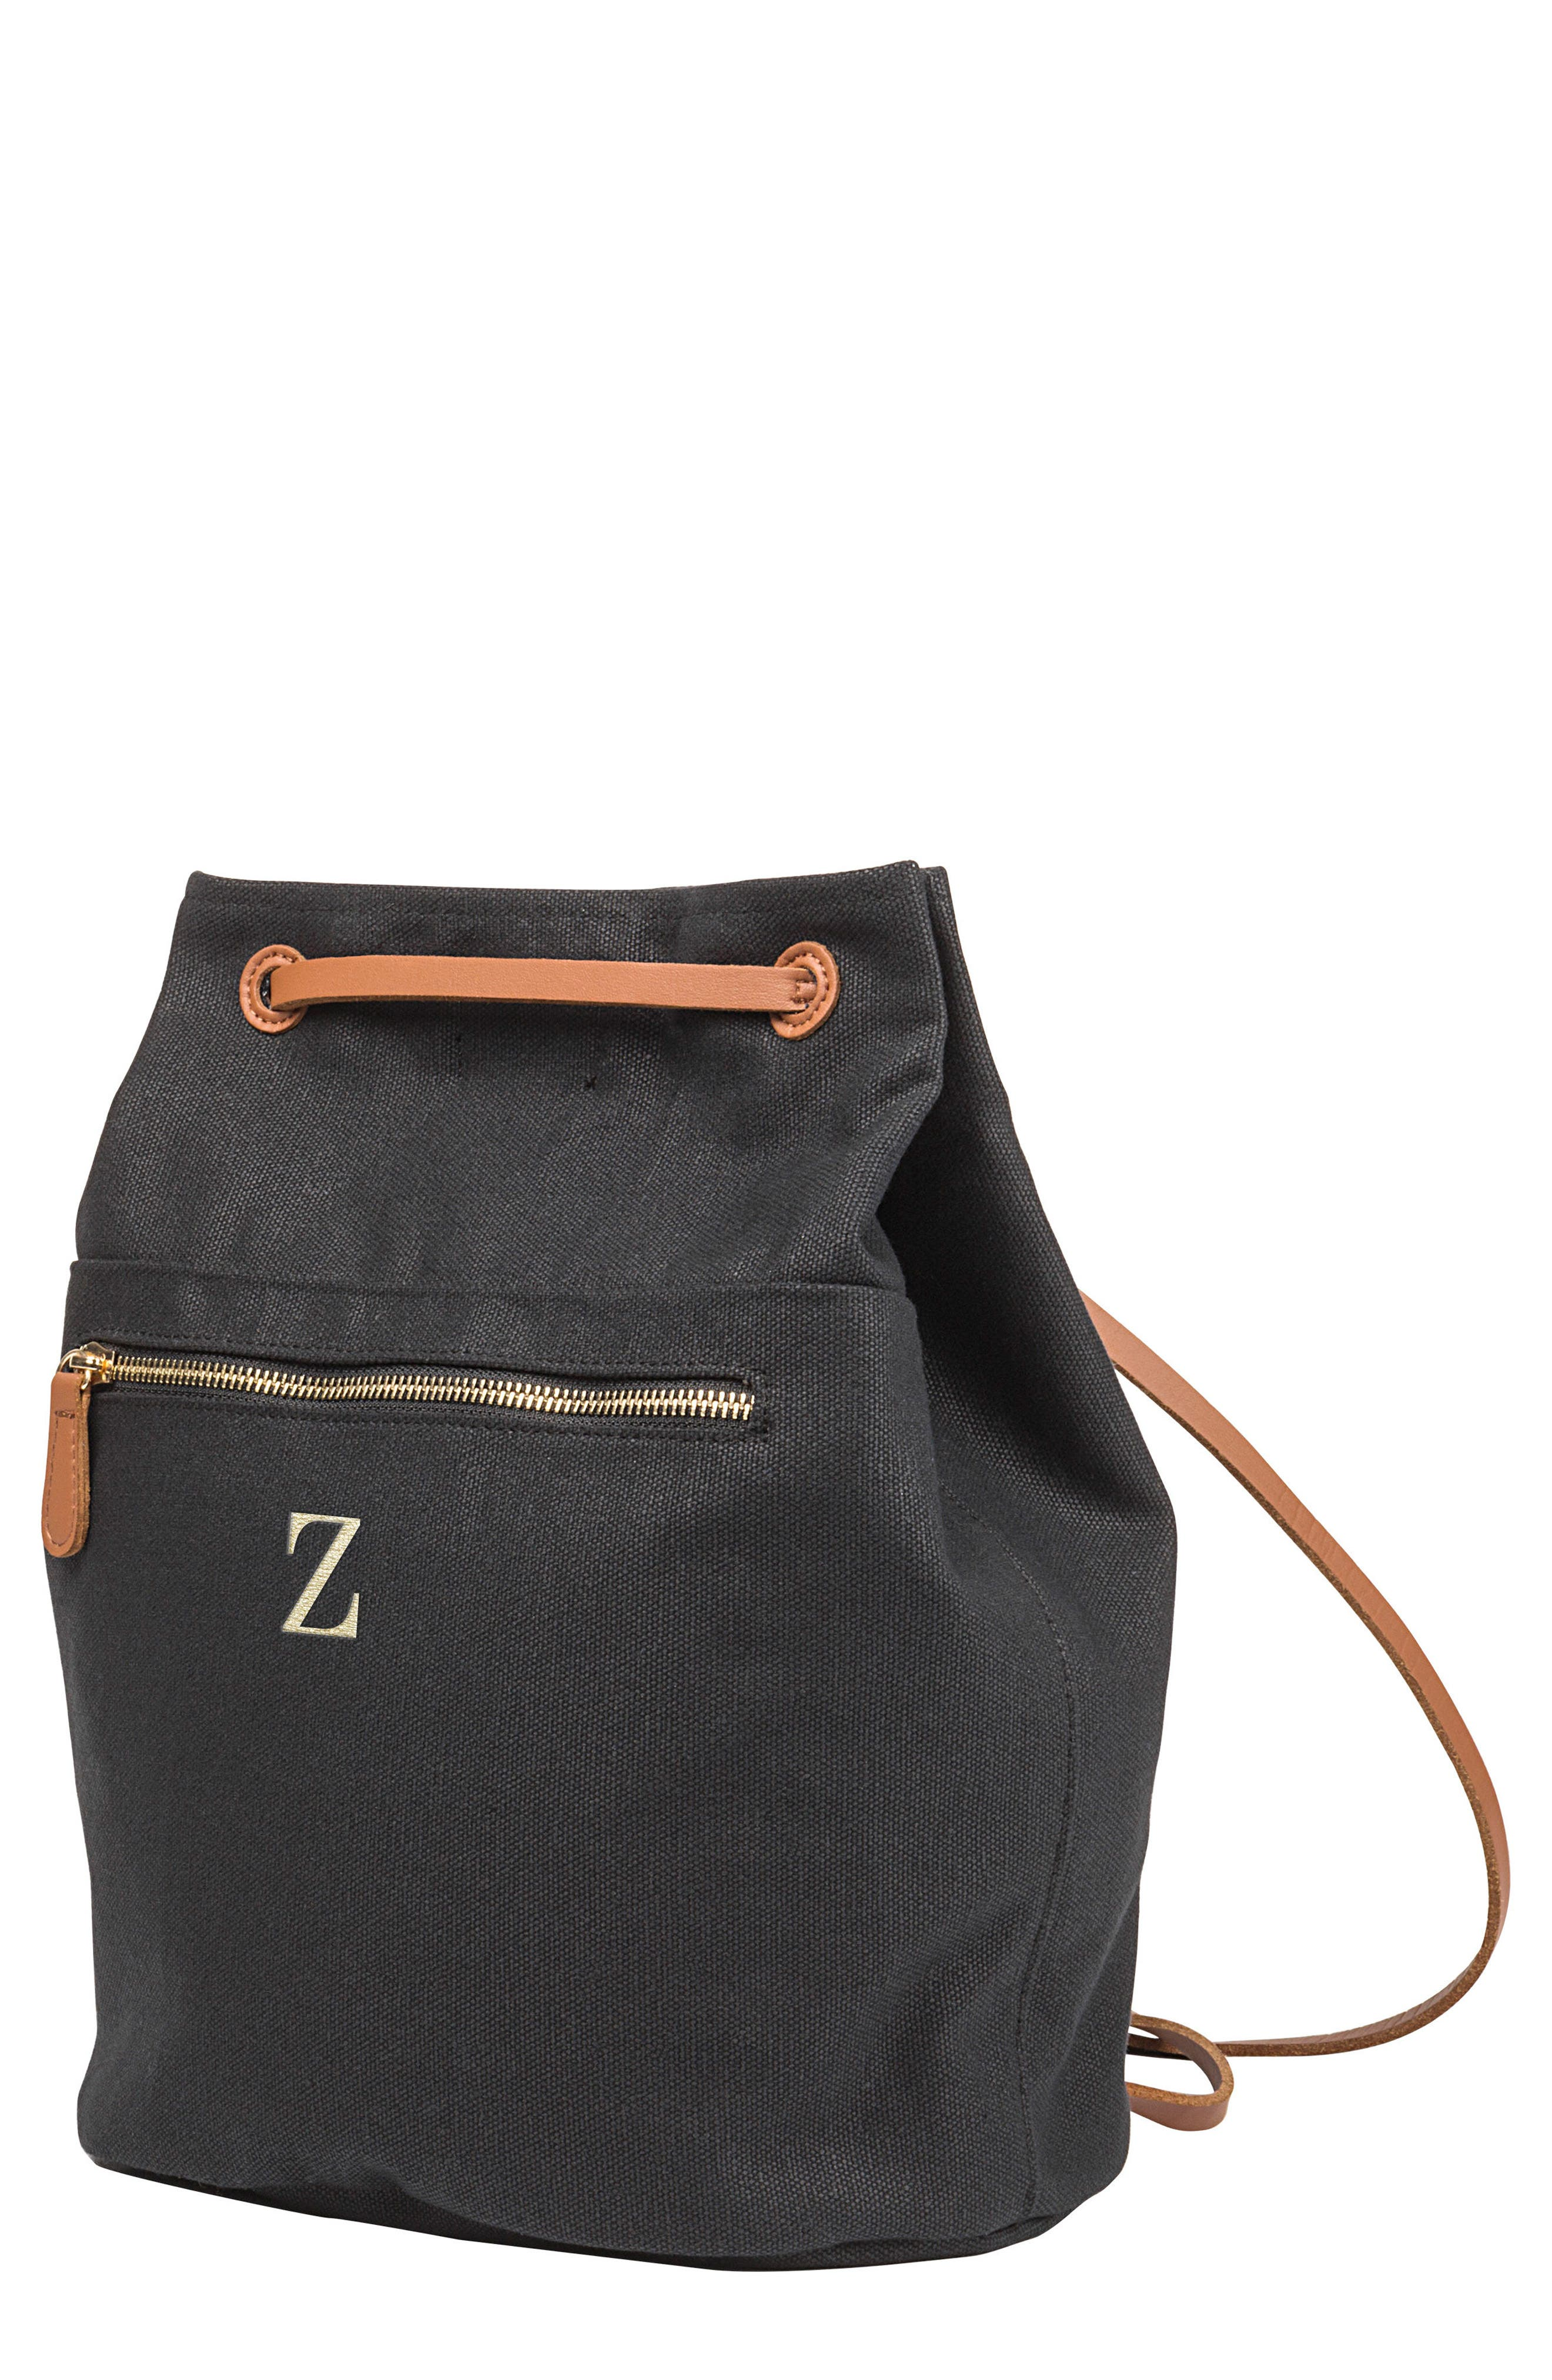 Monogram Convertible Backpack,                             Main thumbnail 27, color,